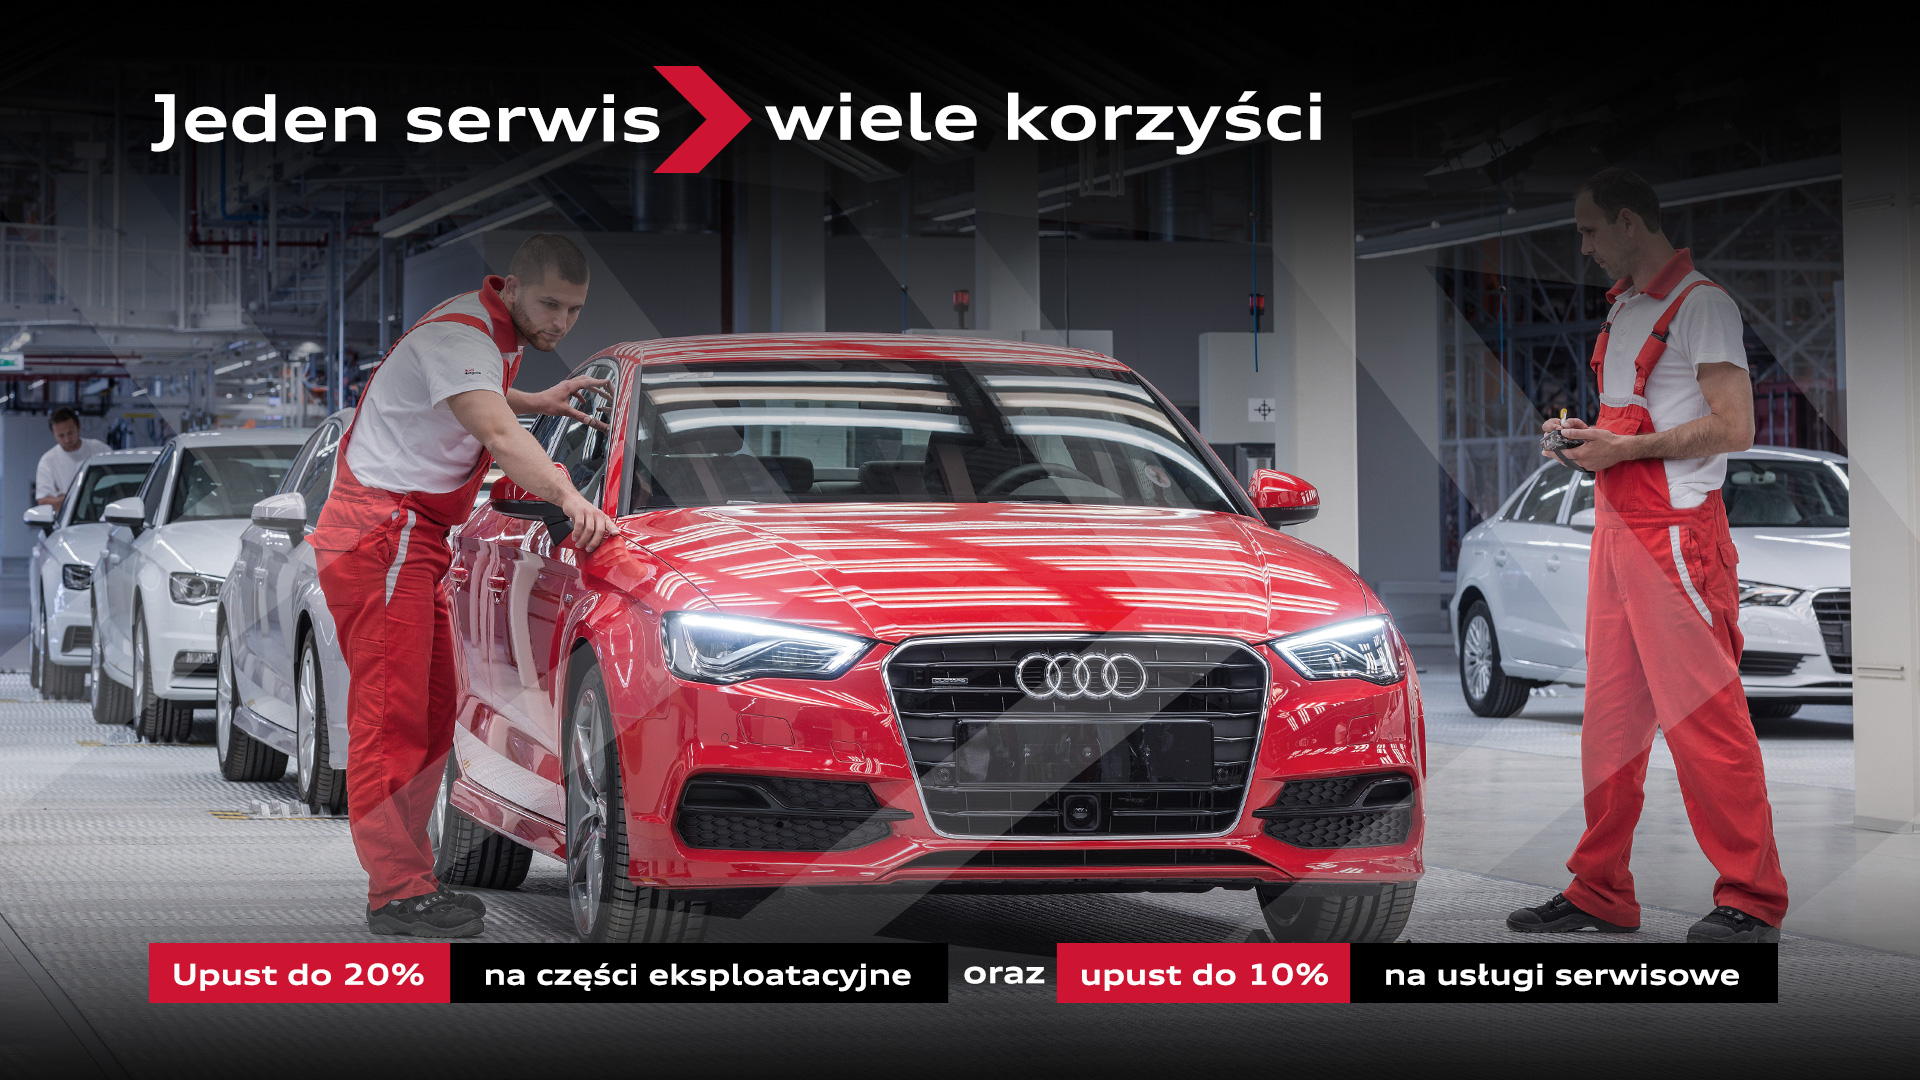 Serwis Audi